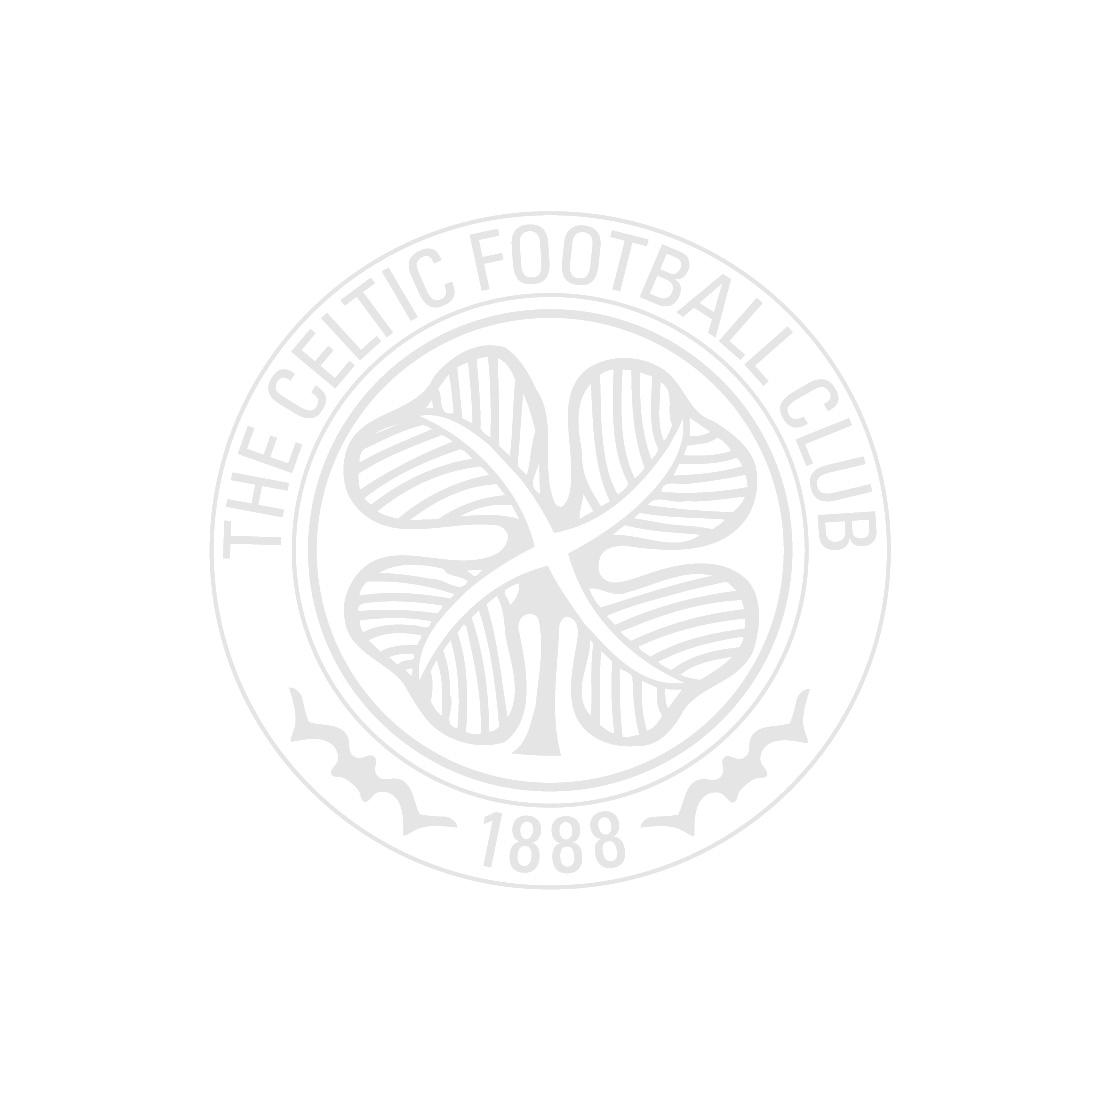 Celtic Crest & Decal Set